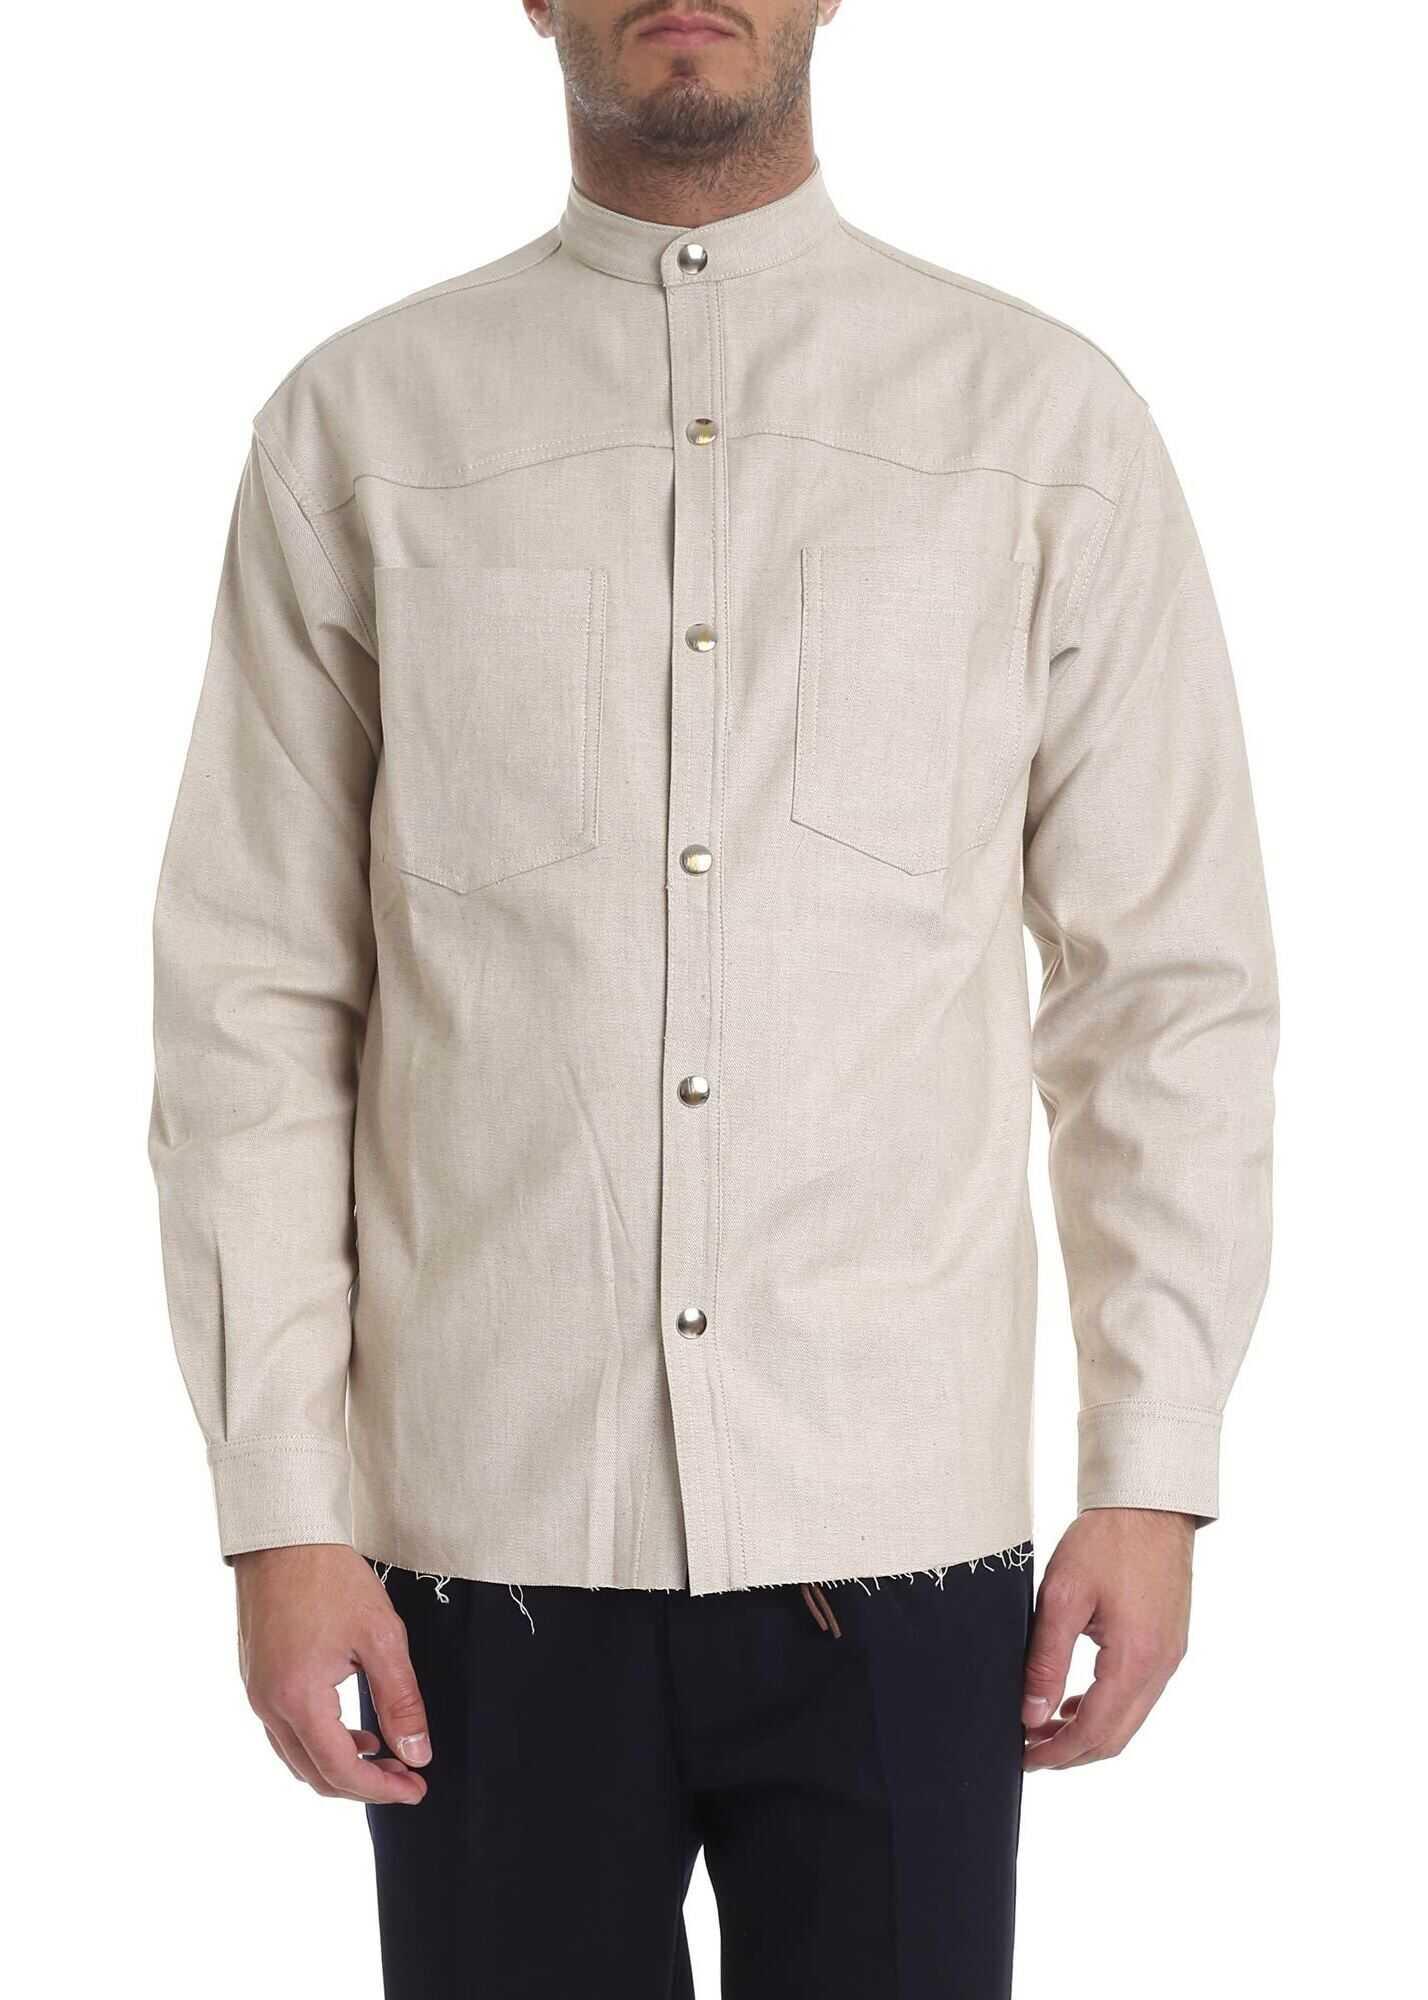 Ribbon Clothing Mandarin Collar Shirt In Melange Beige Beige imagine